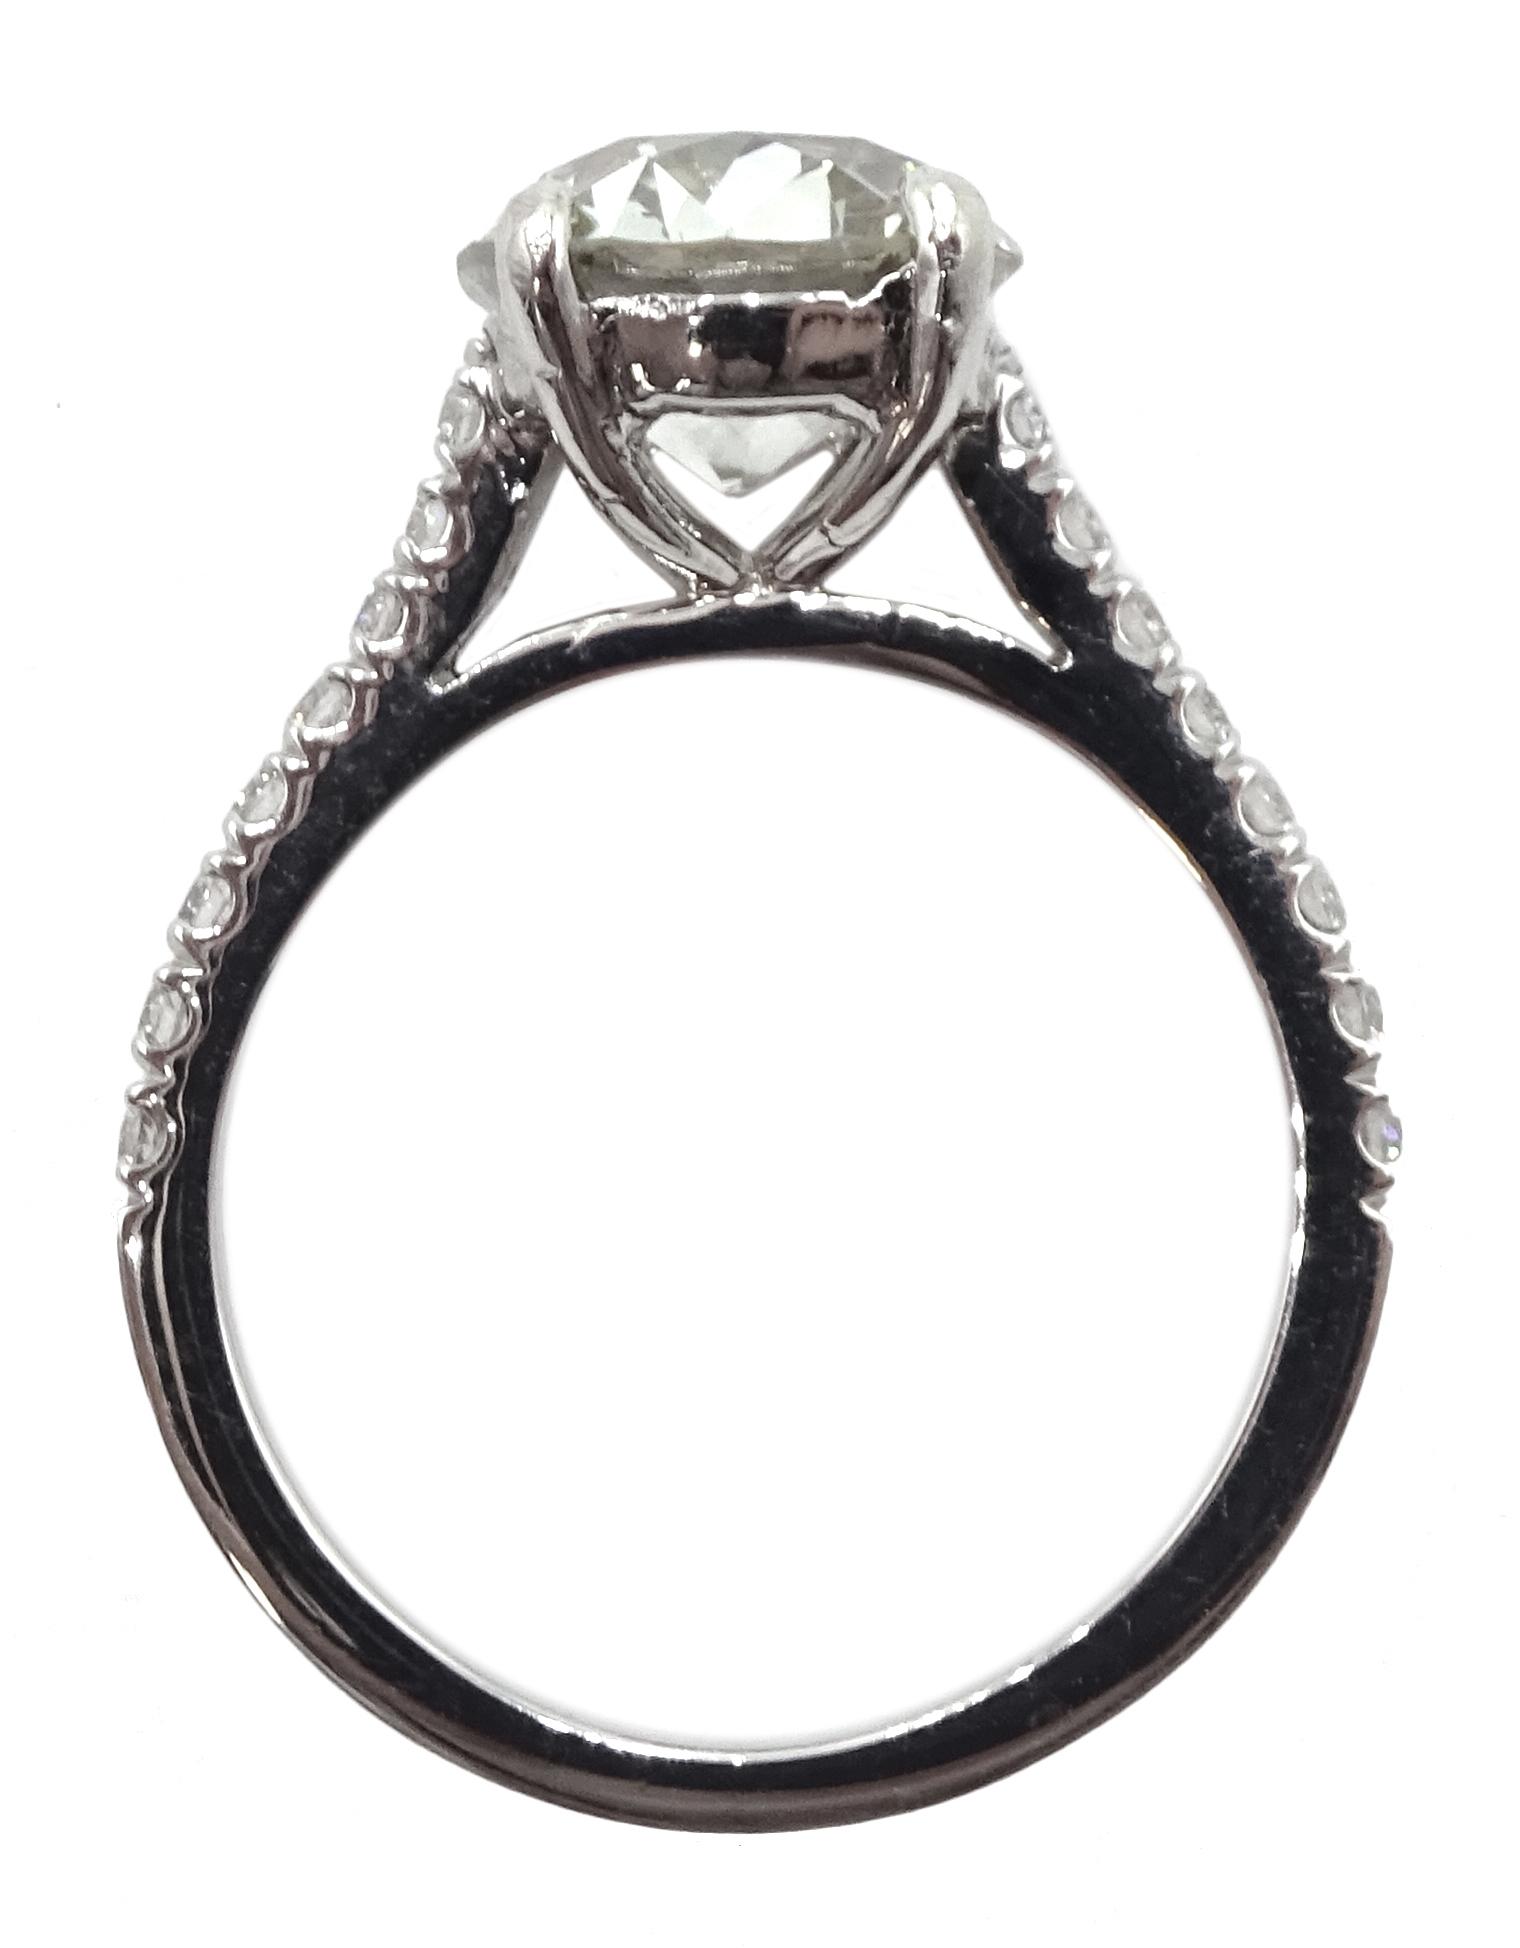 Platinum old cut diamond solitaire ring - Image 7 of 9